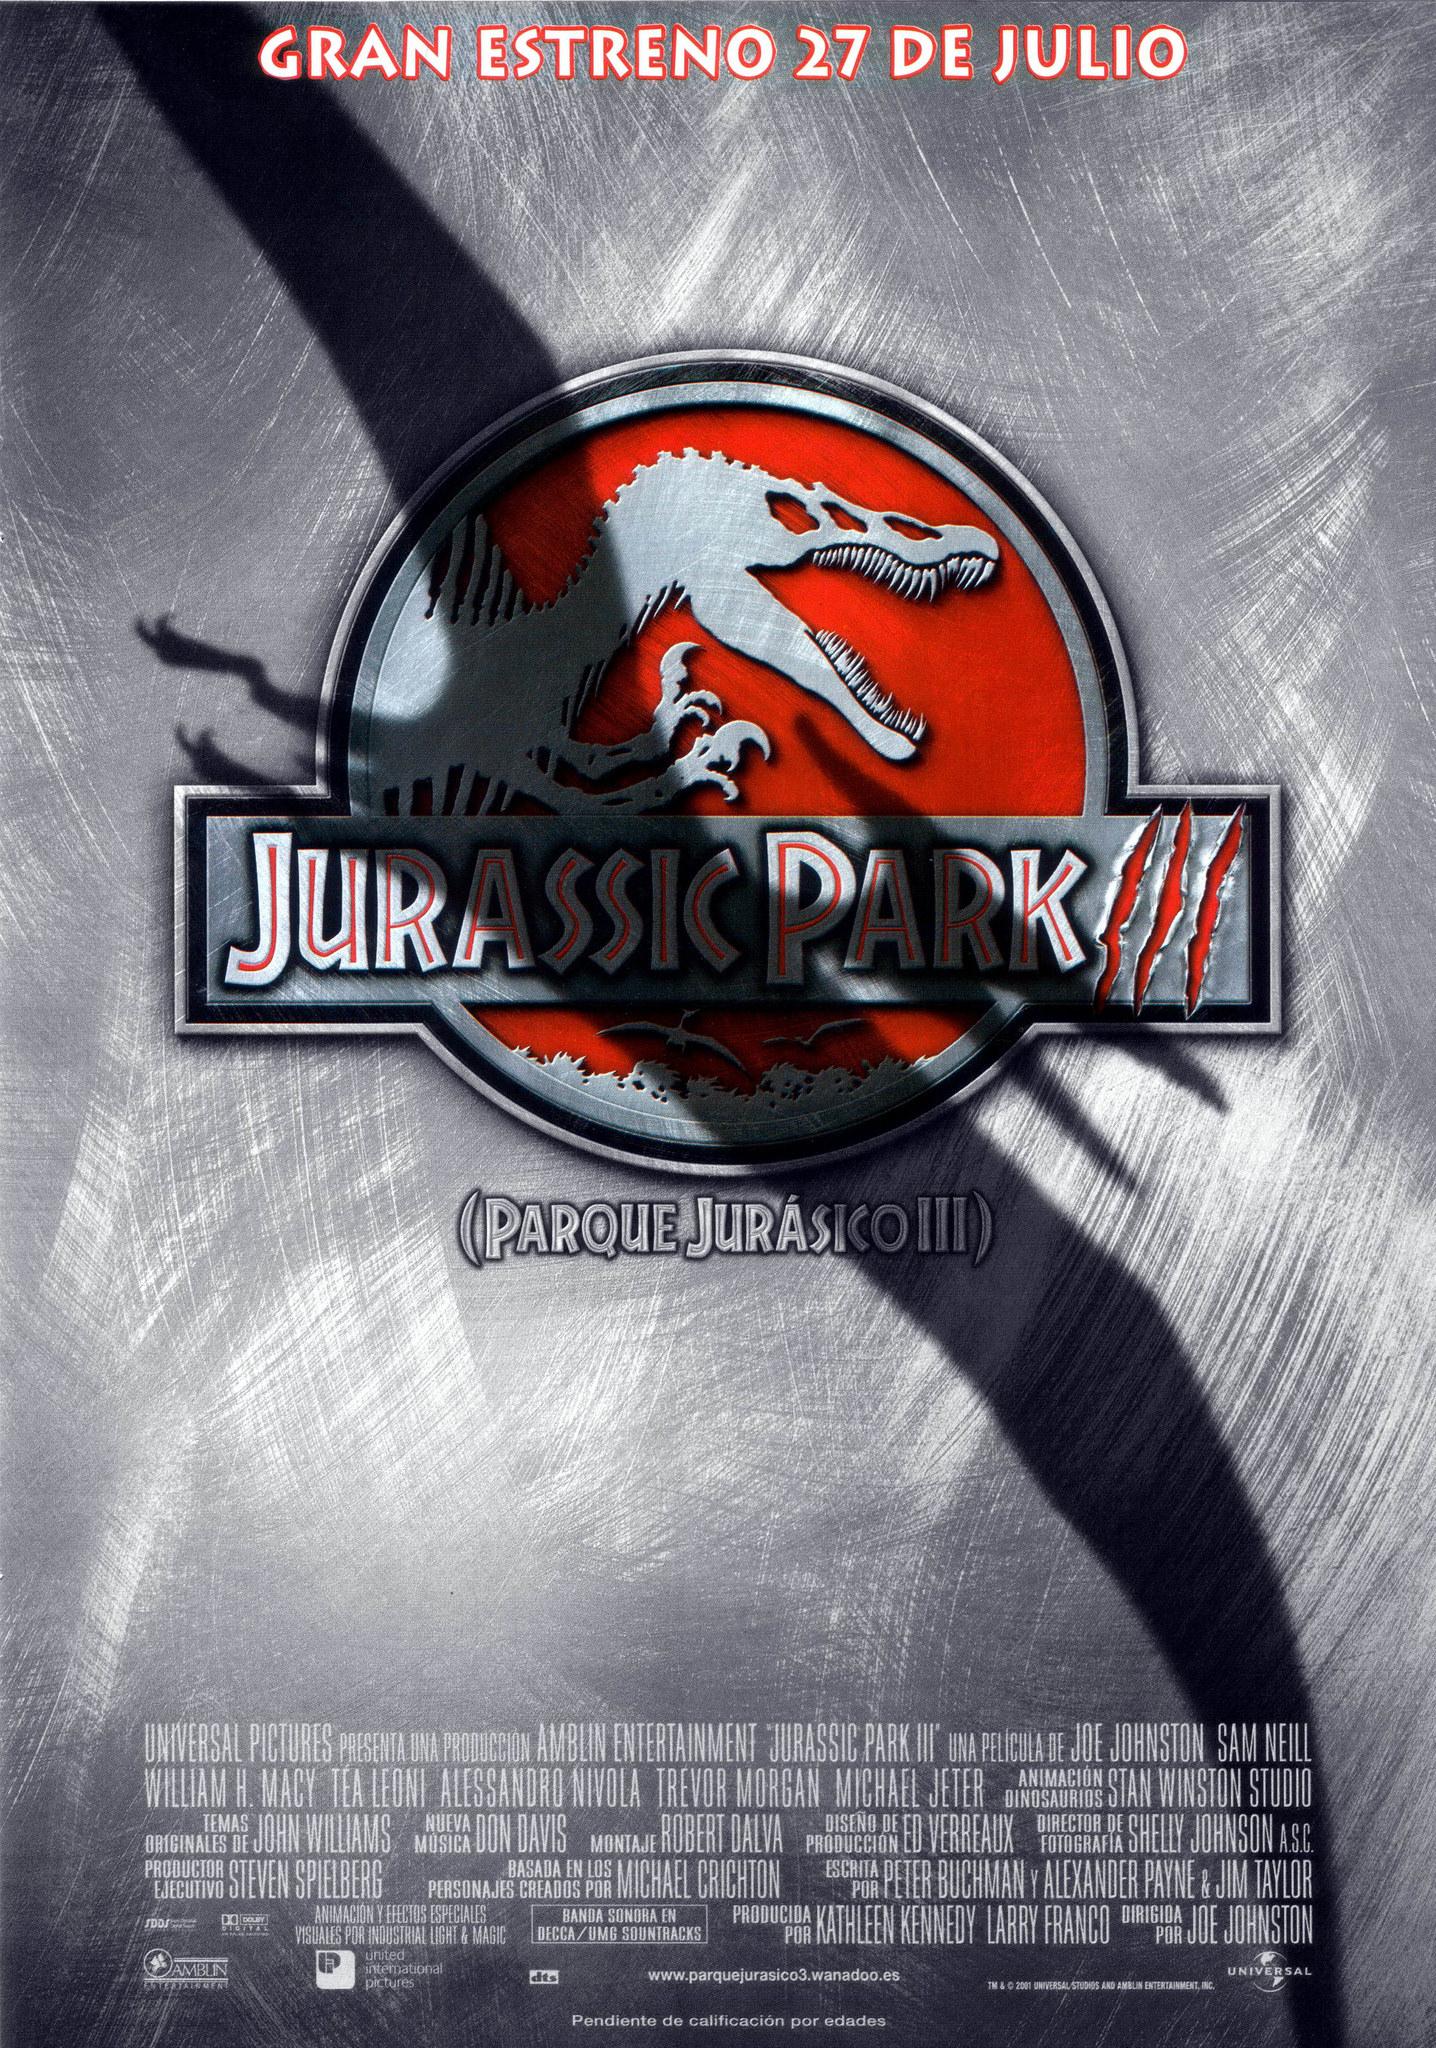 Parque Jurásico Iii Jurassic Park Wiki Fandom